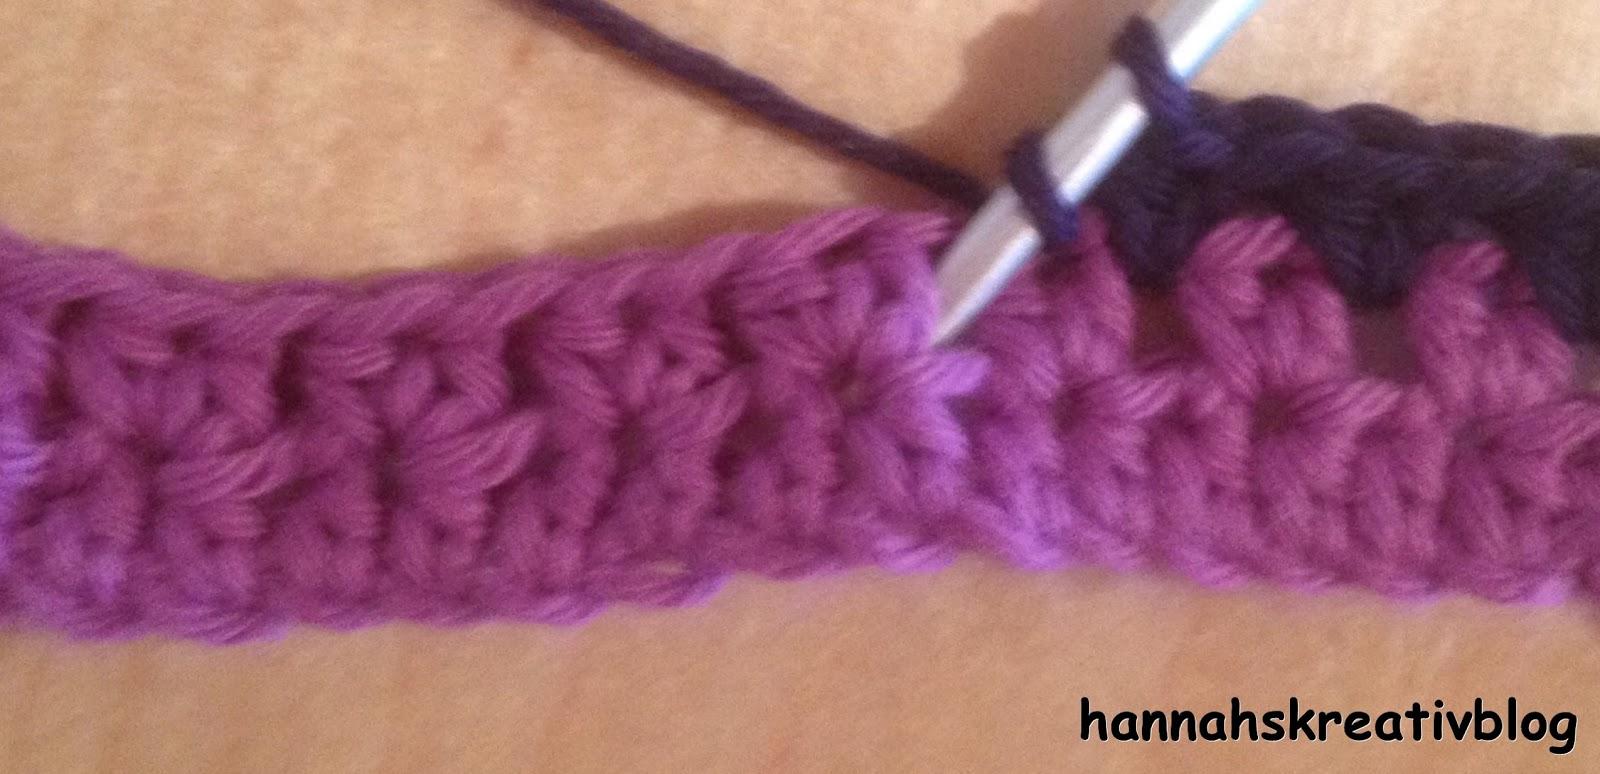 Hannahs Kreativblog: Mai 2015